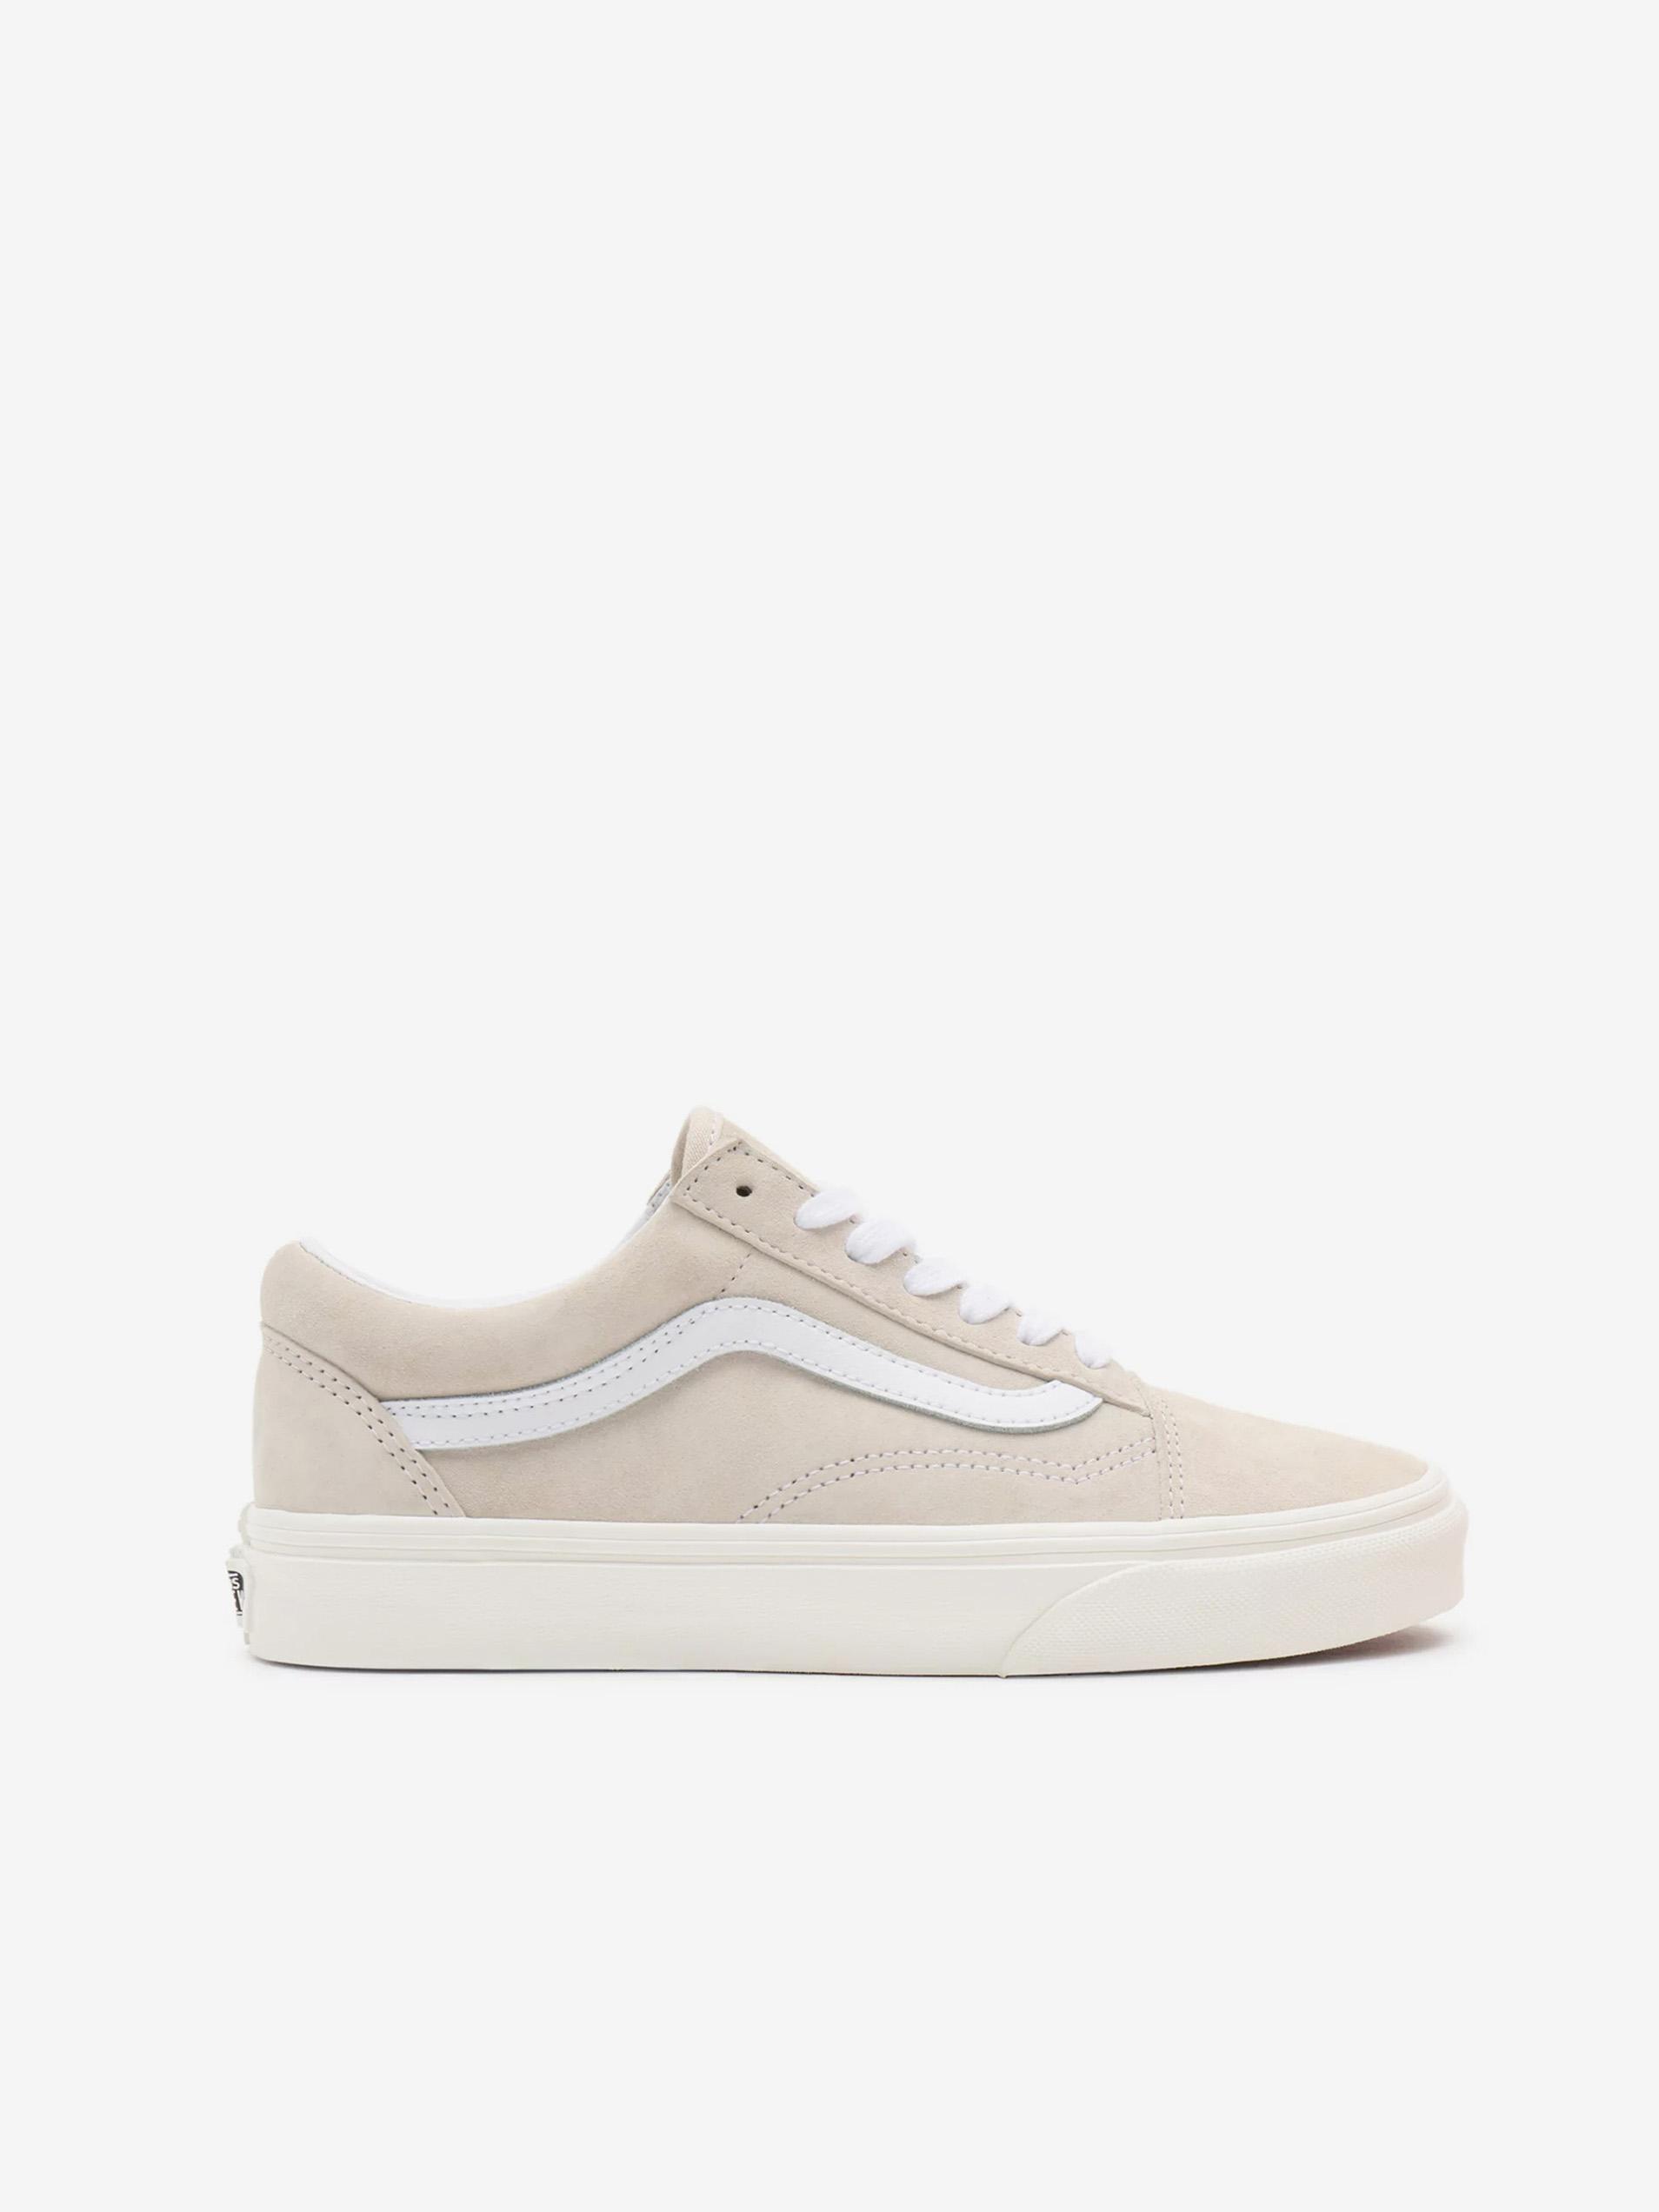 Bielo-béžové pánske semišové topánky VANS Old Skool - 36